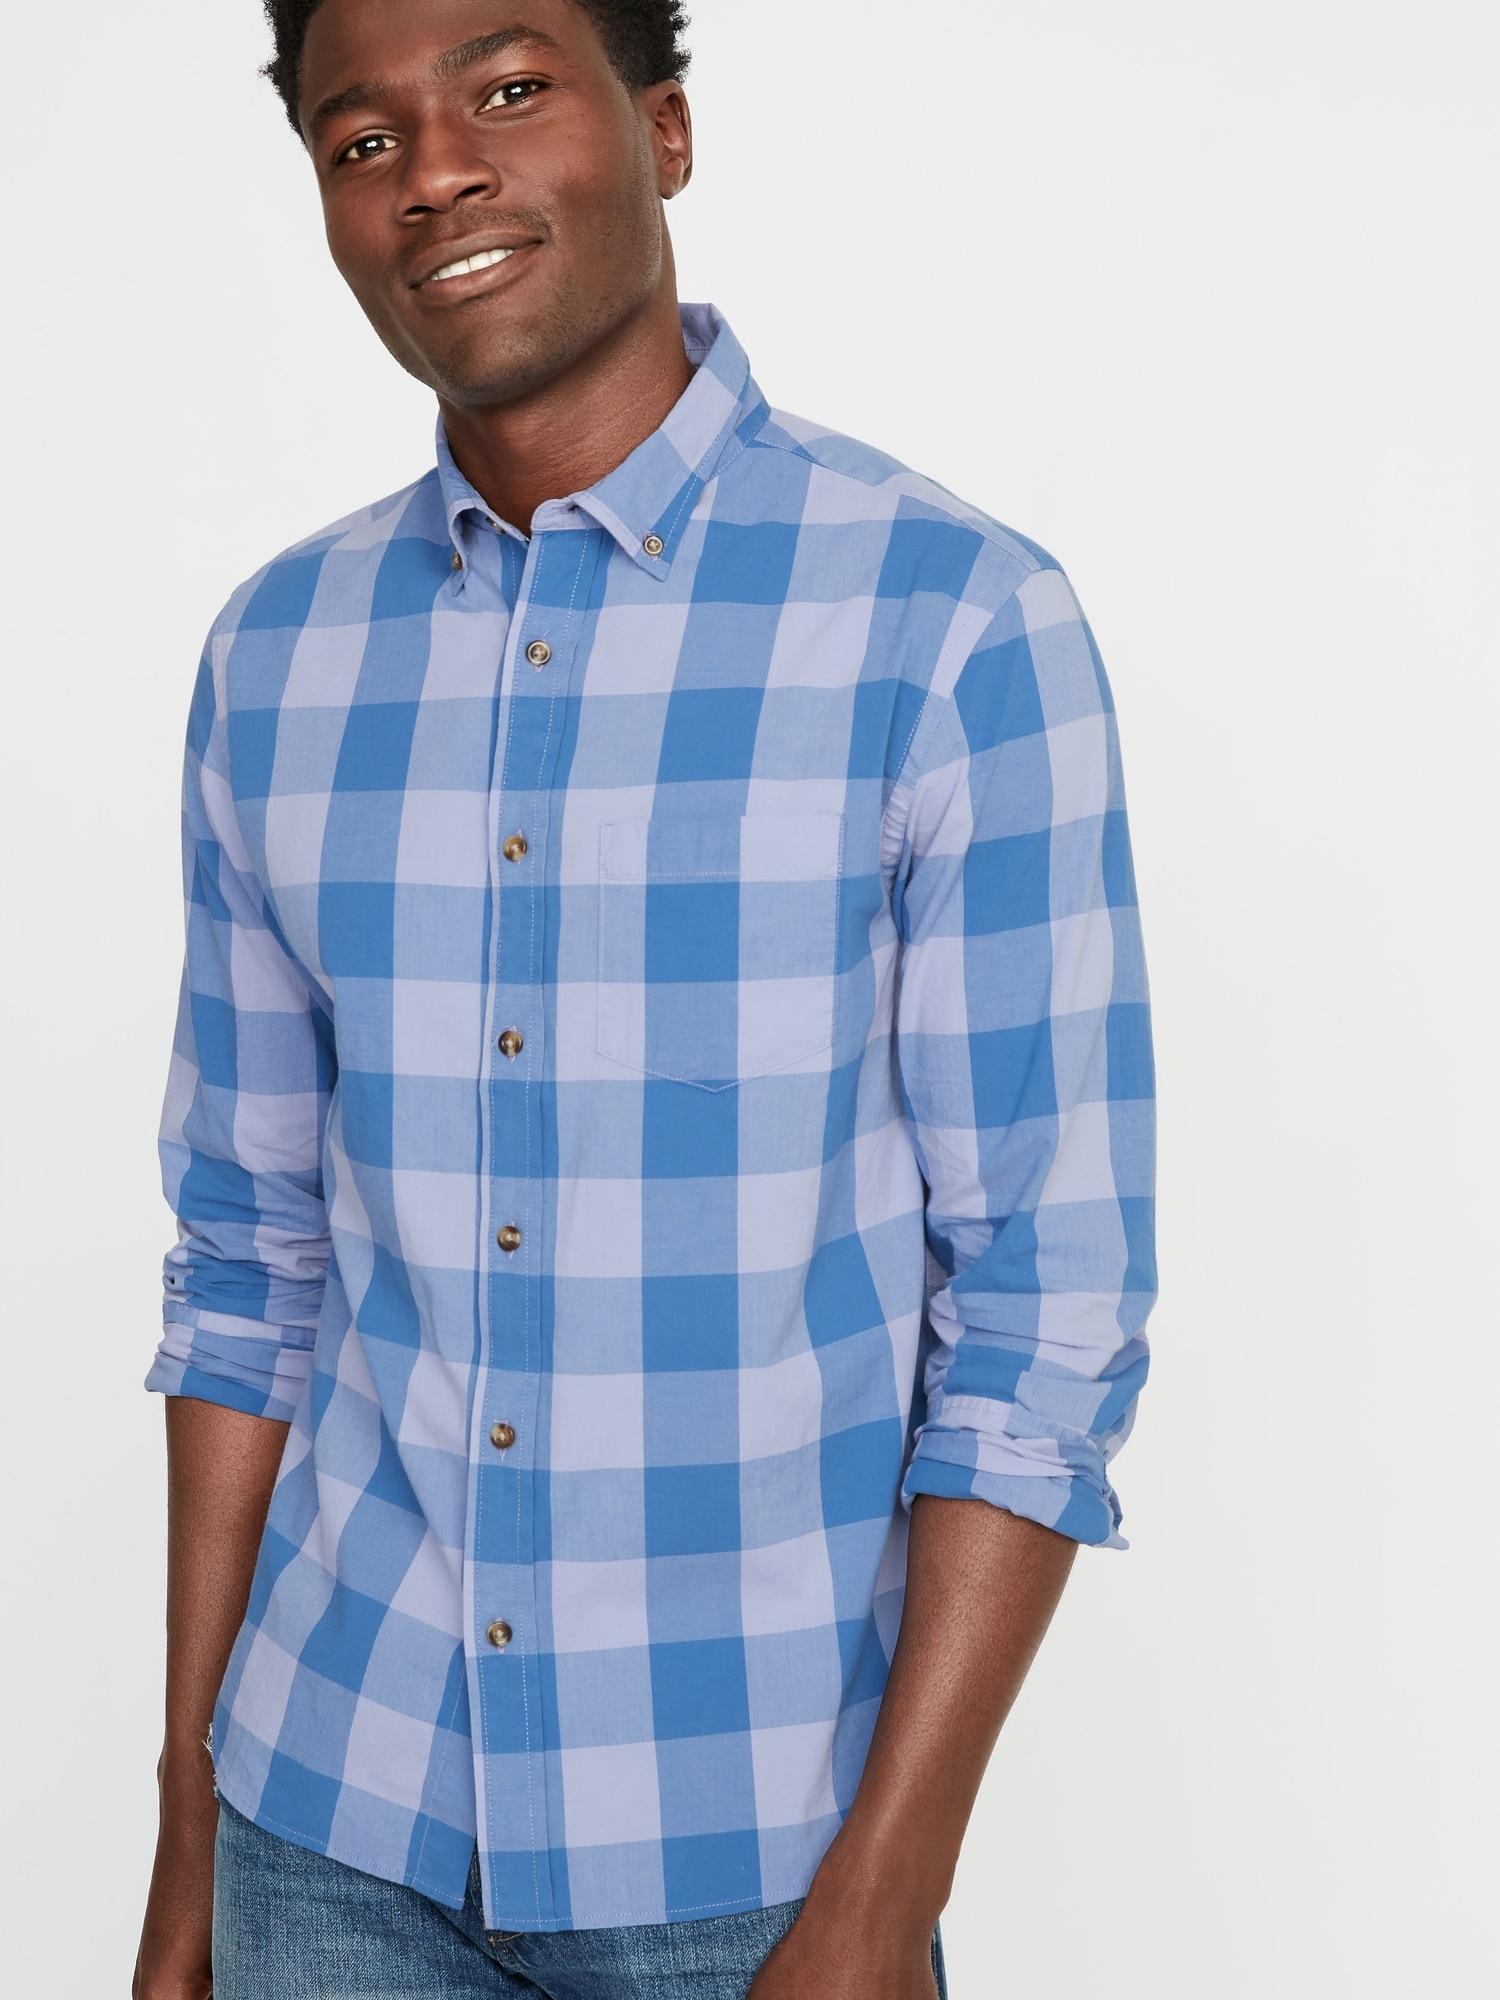 6d40d5c2145 Slim-Fit Built-In Flex Everyday Shirt for Men